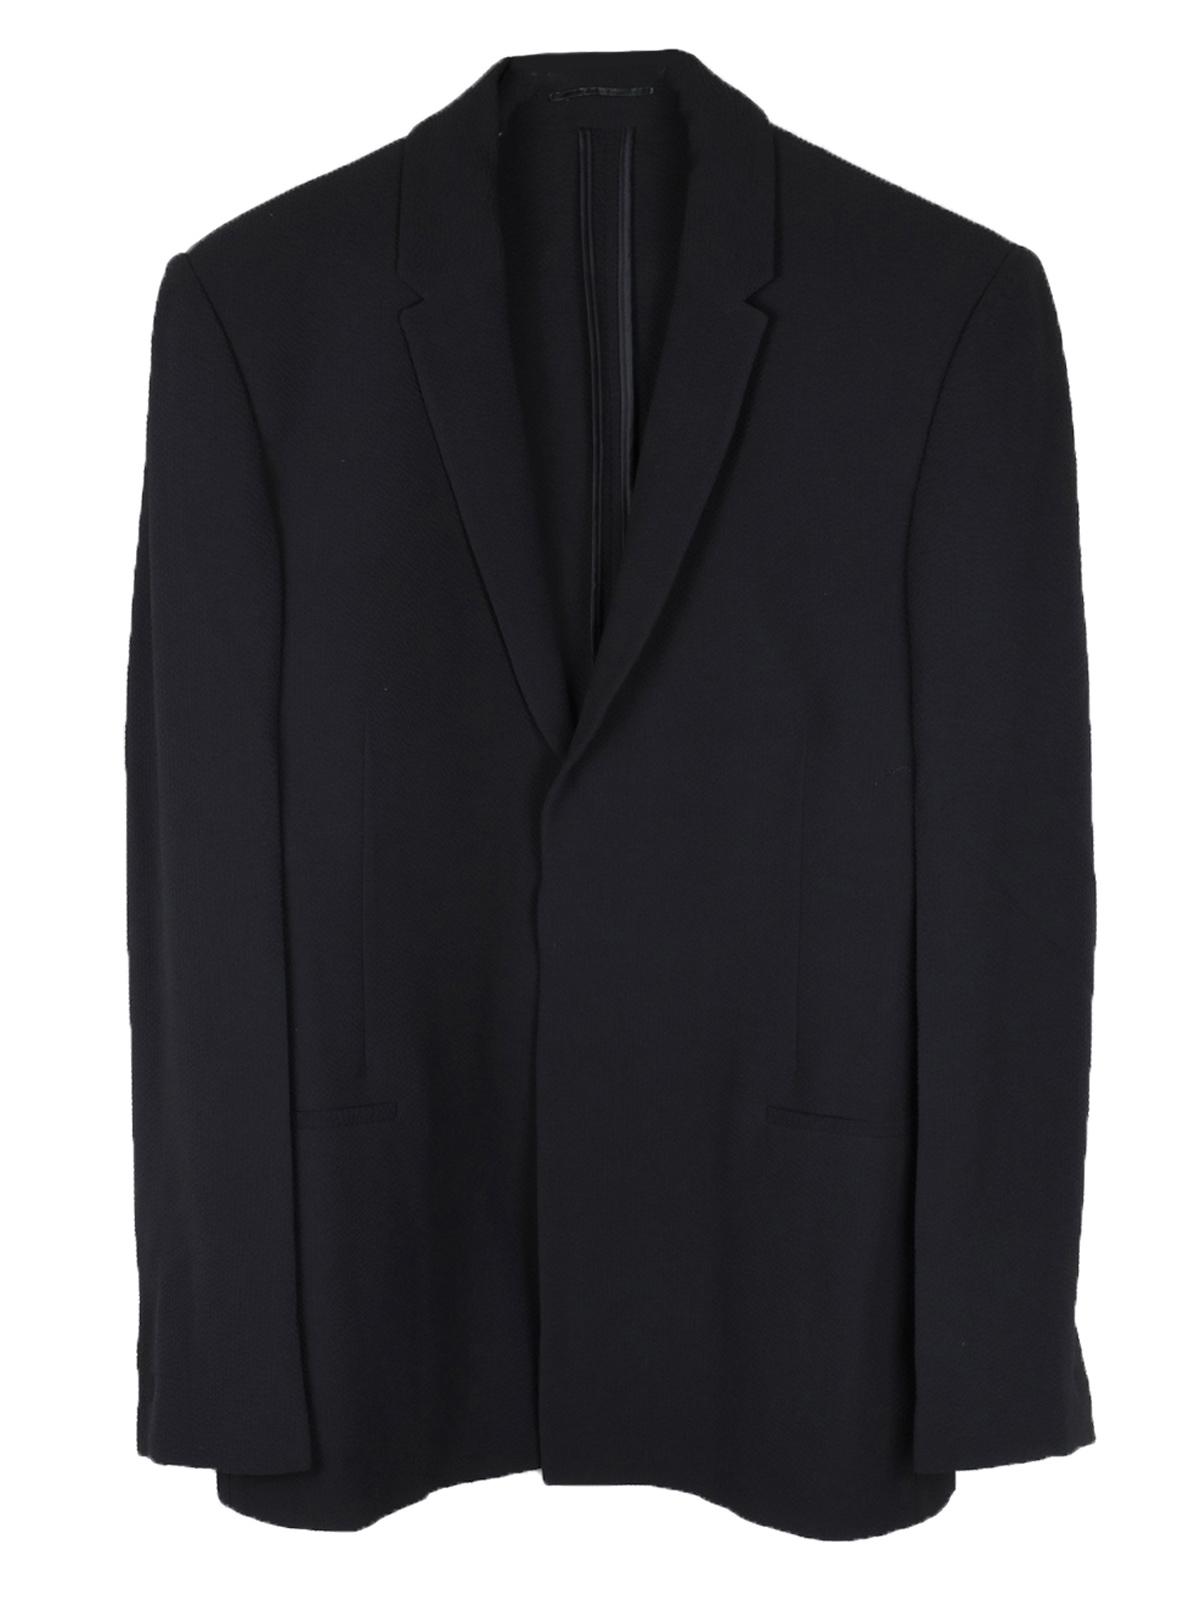 Kilgour Wool Tailored Blazer